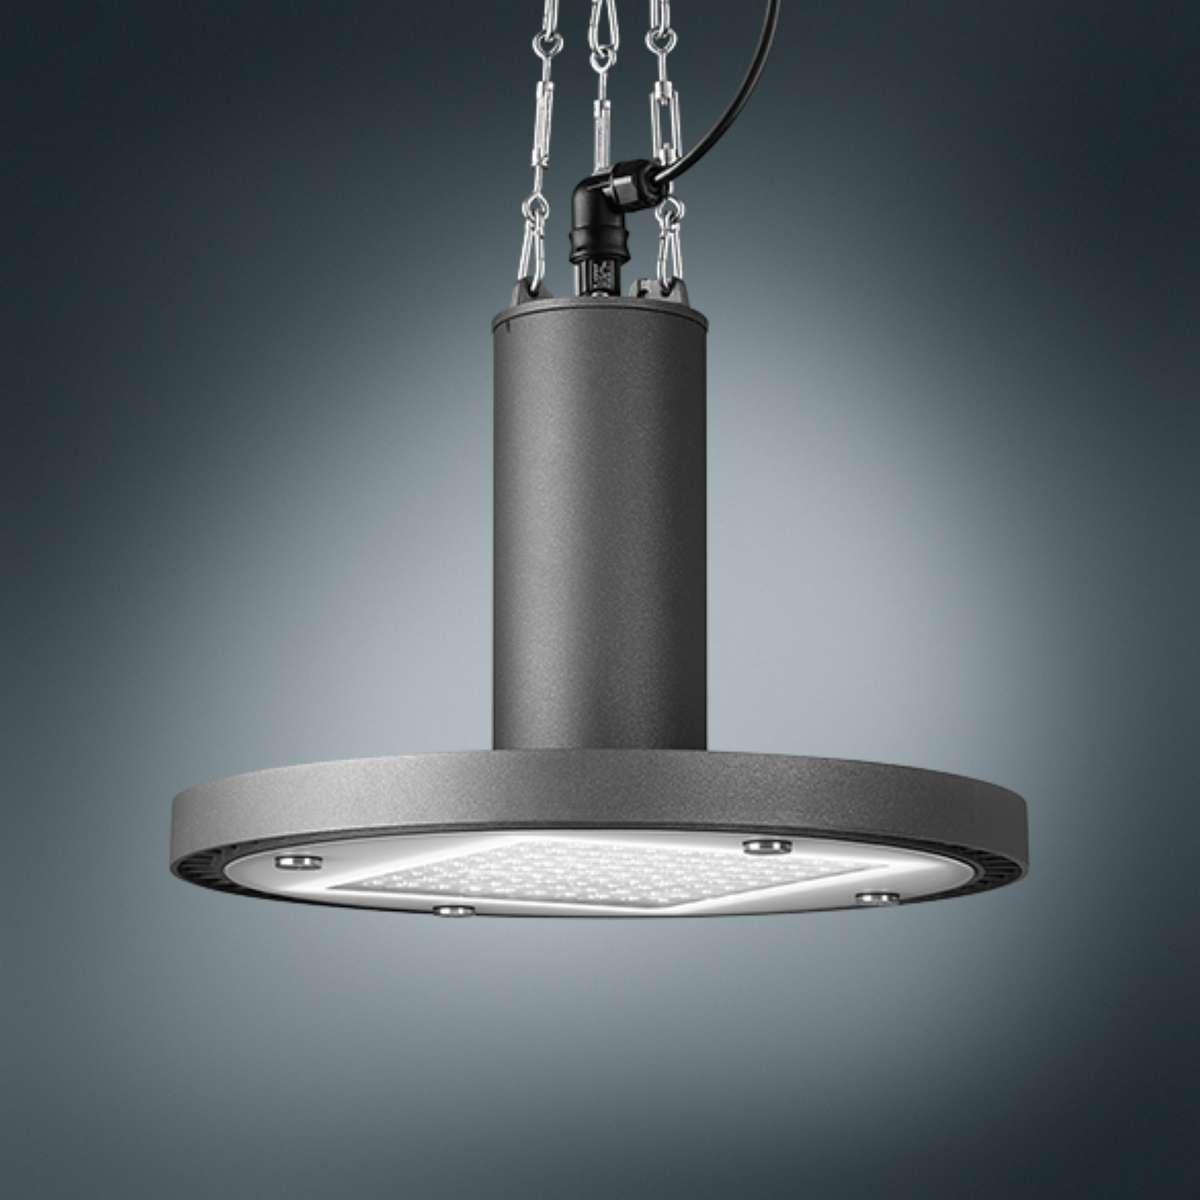 mirona rl round ceiling luminaire industrial luminaires. Black Bedroom Furniture Sets. Home Design Ideas